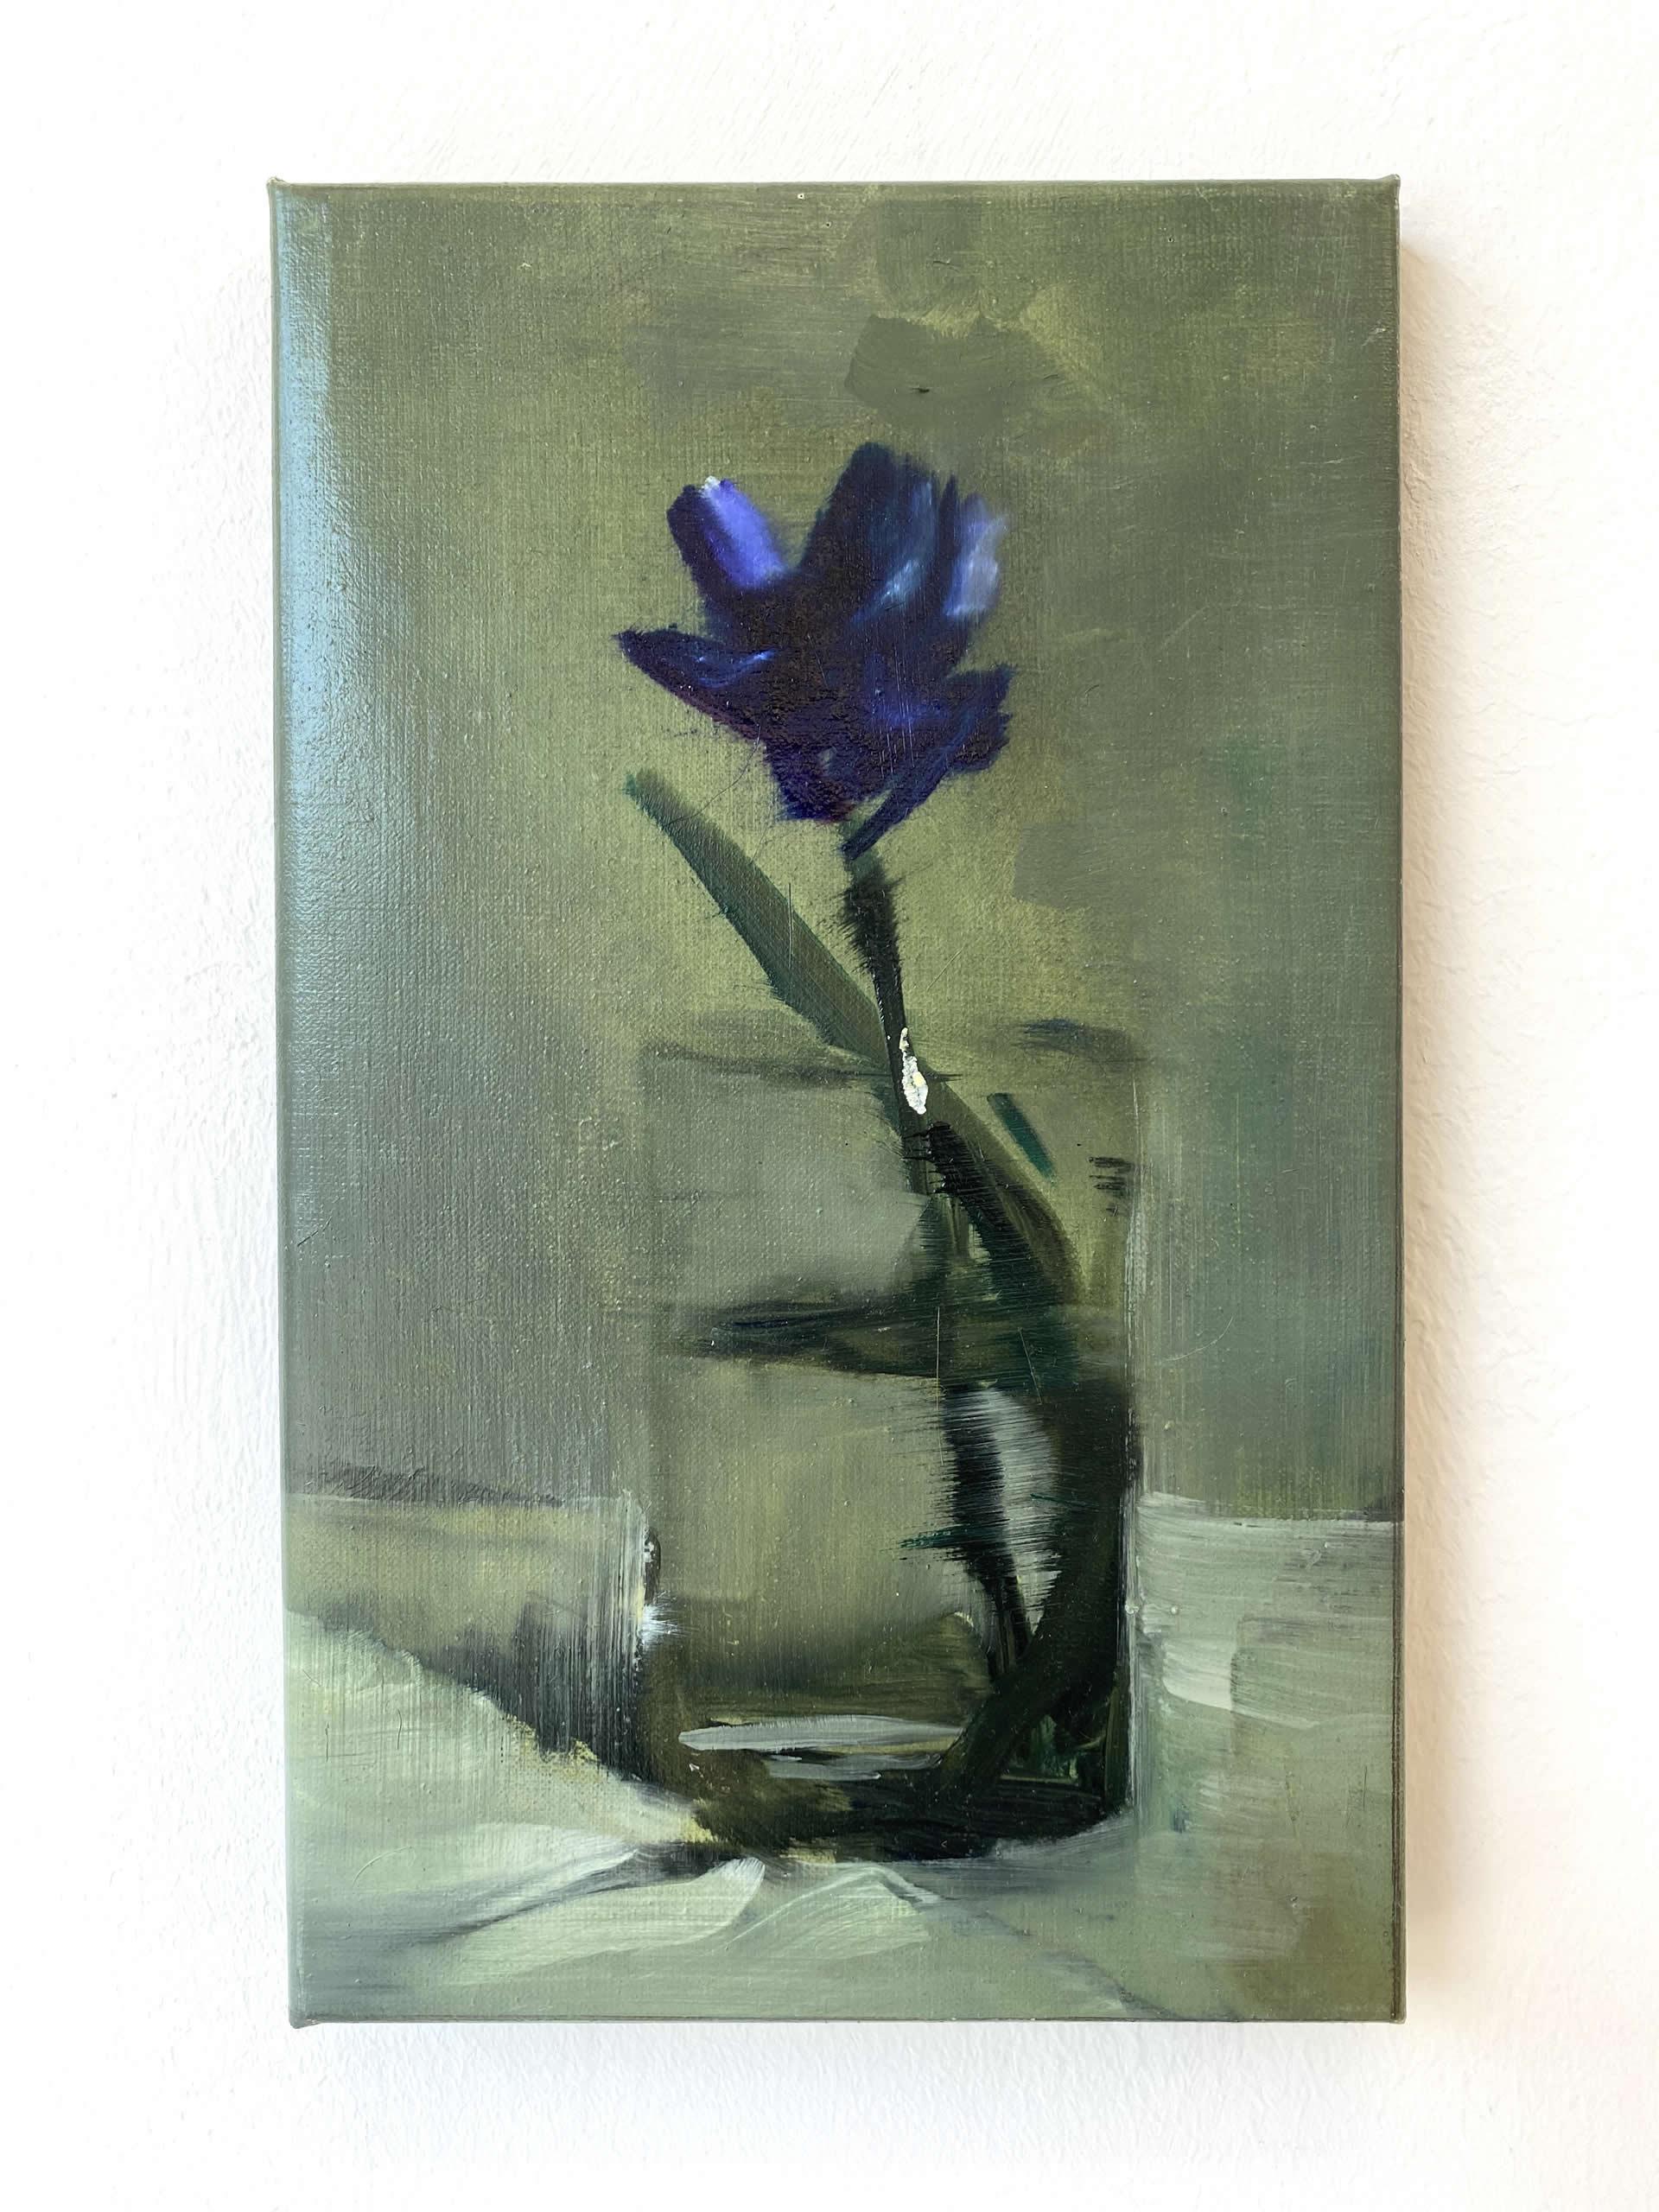 Alex Amann | 2020 | Öl auf Leinwand | 33x20cm | plaisirs simples | Galerie3